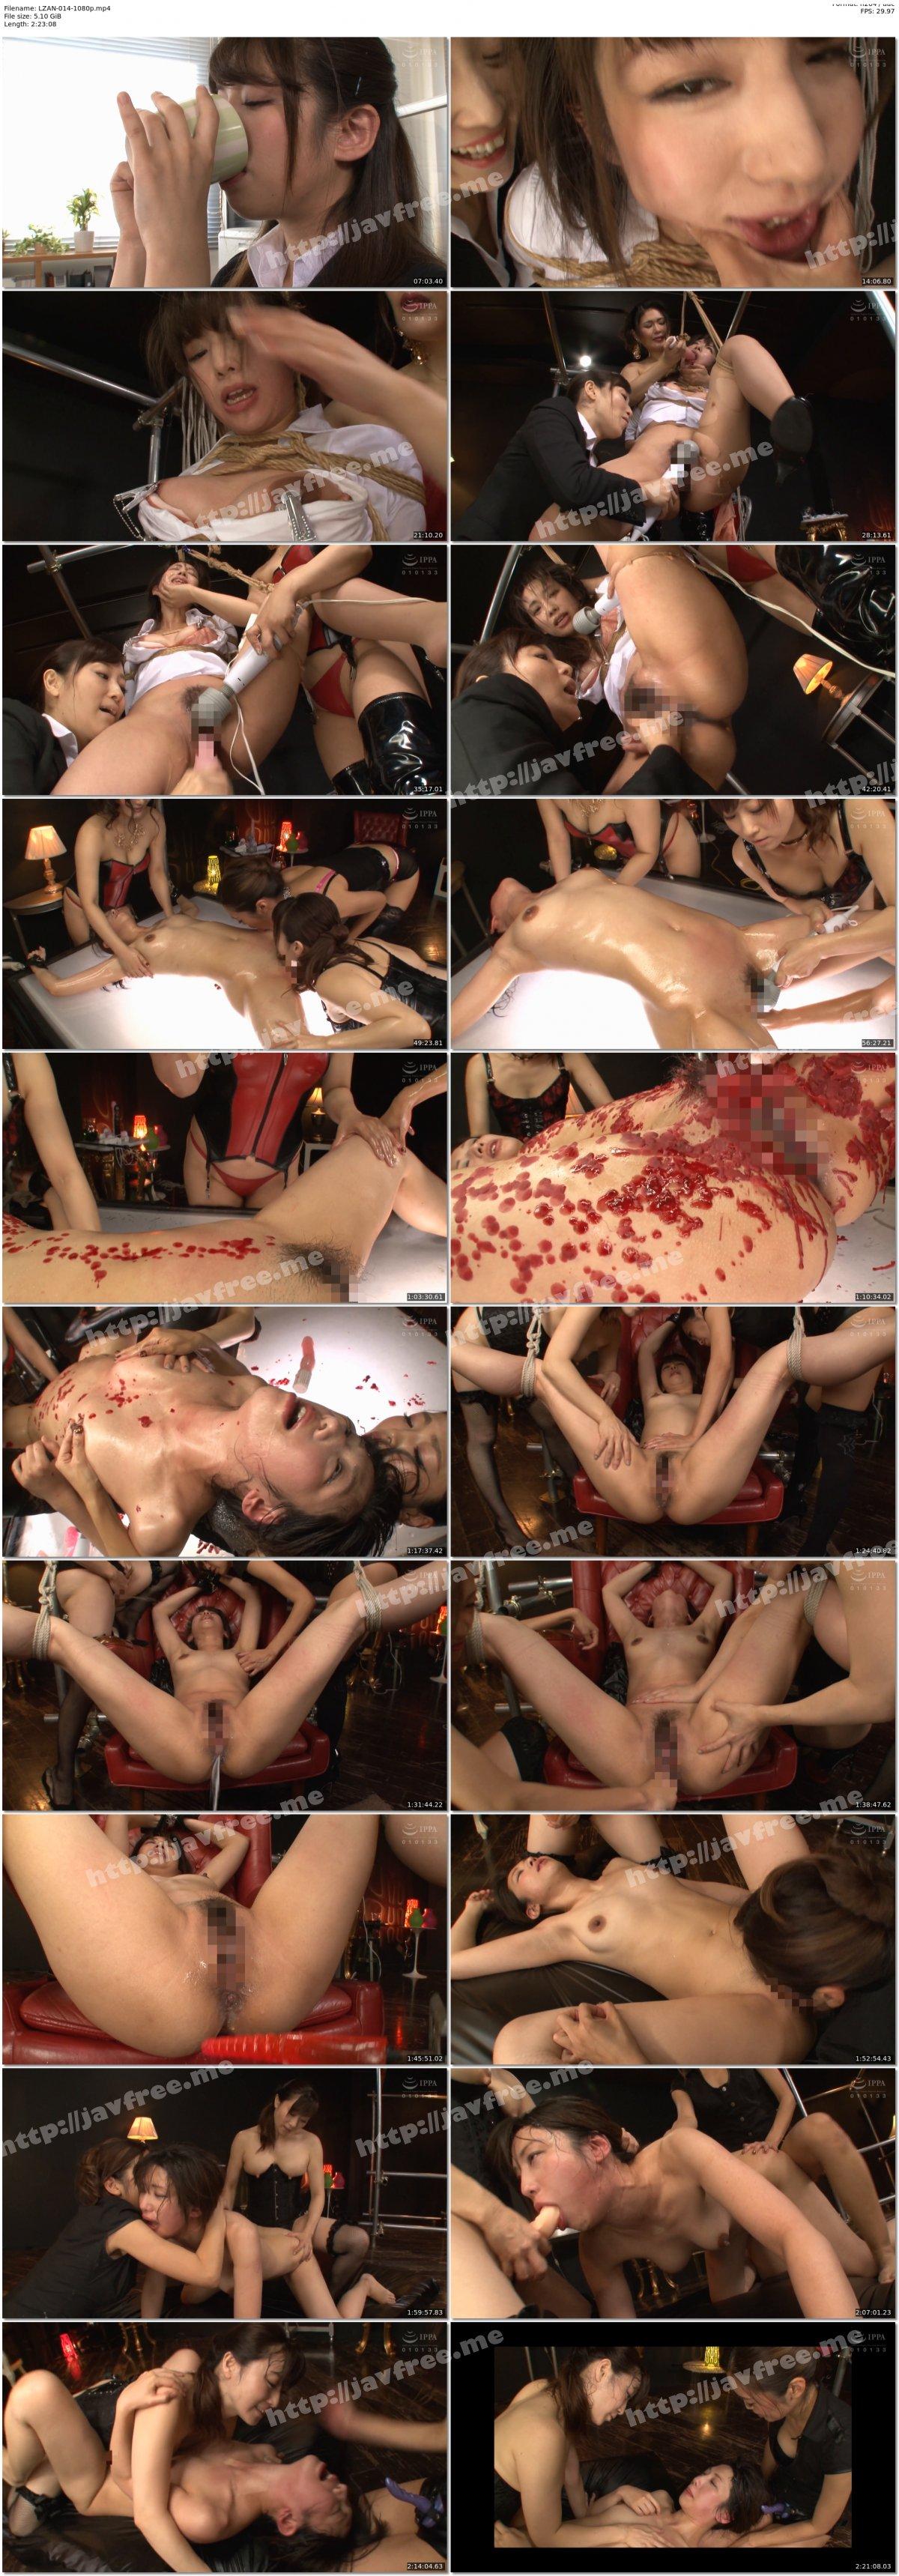 [HD][LZAN-014] ポルチオ残酷レズ折檻 愛、凌辱 III ~レズれ!史上最狂!涙と淫汁に塗(まみ)れた女の崩壊~ - image LZAN-014-1080p on https://javfree.me